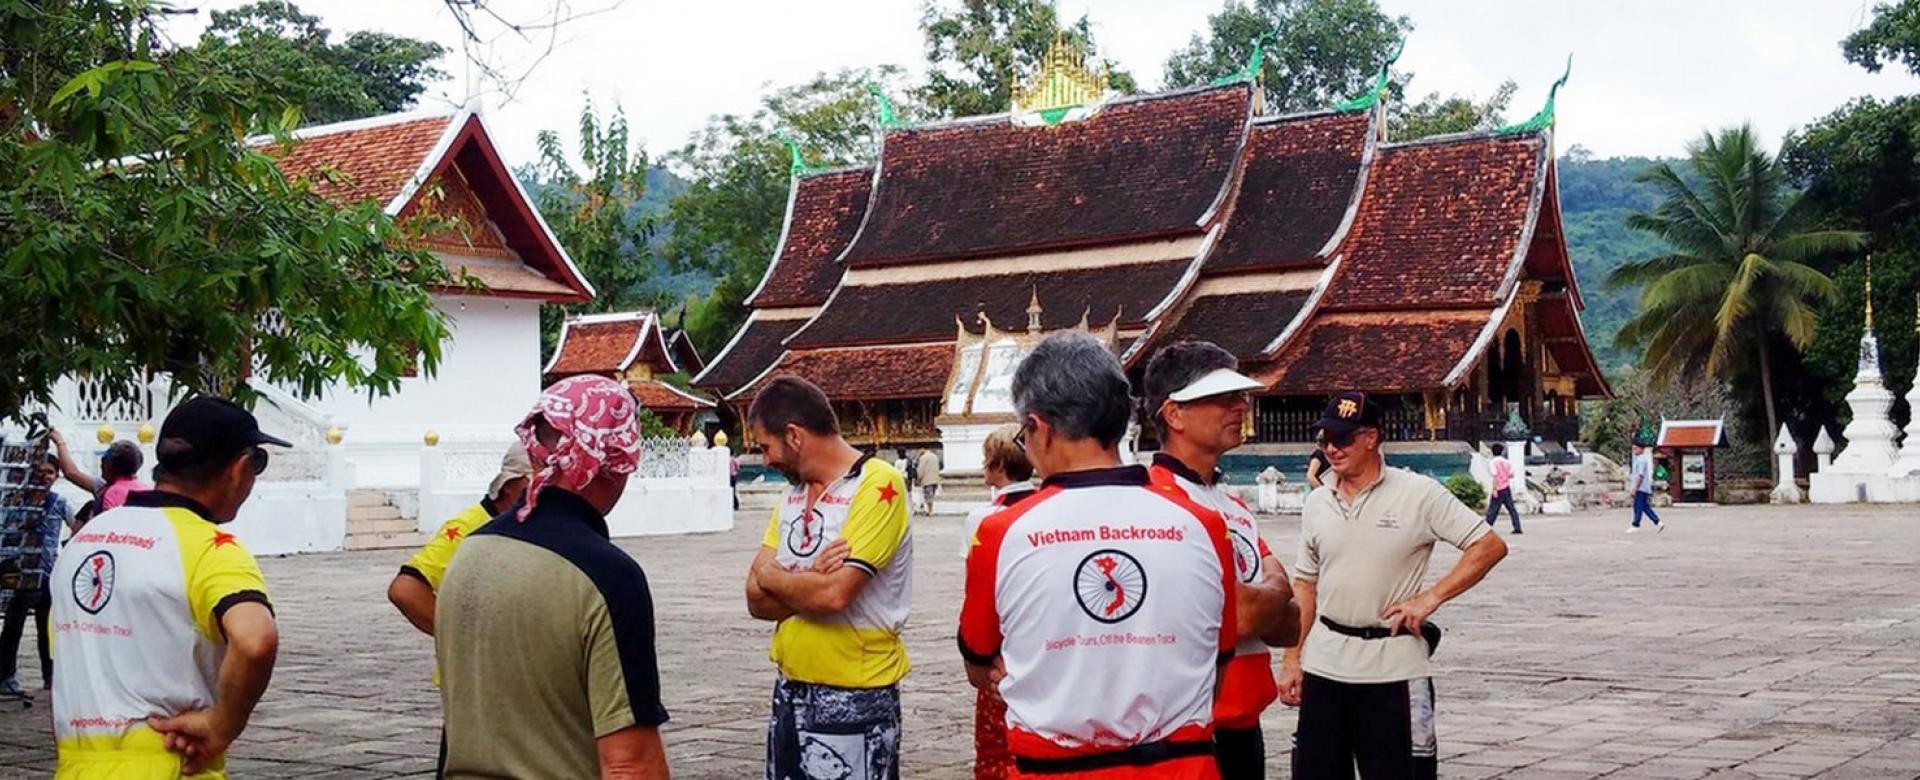 Biking adventure Lao Cai - Dien Bien Phu - Muang Khua - Luang Prabang